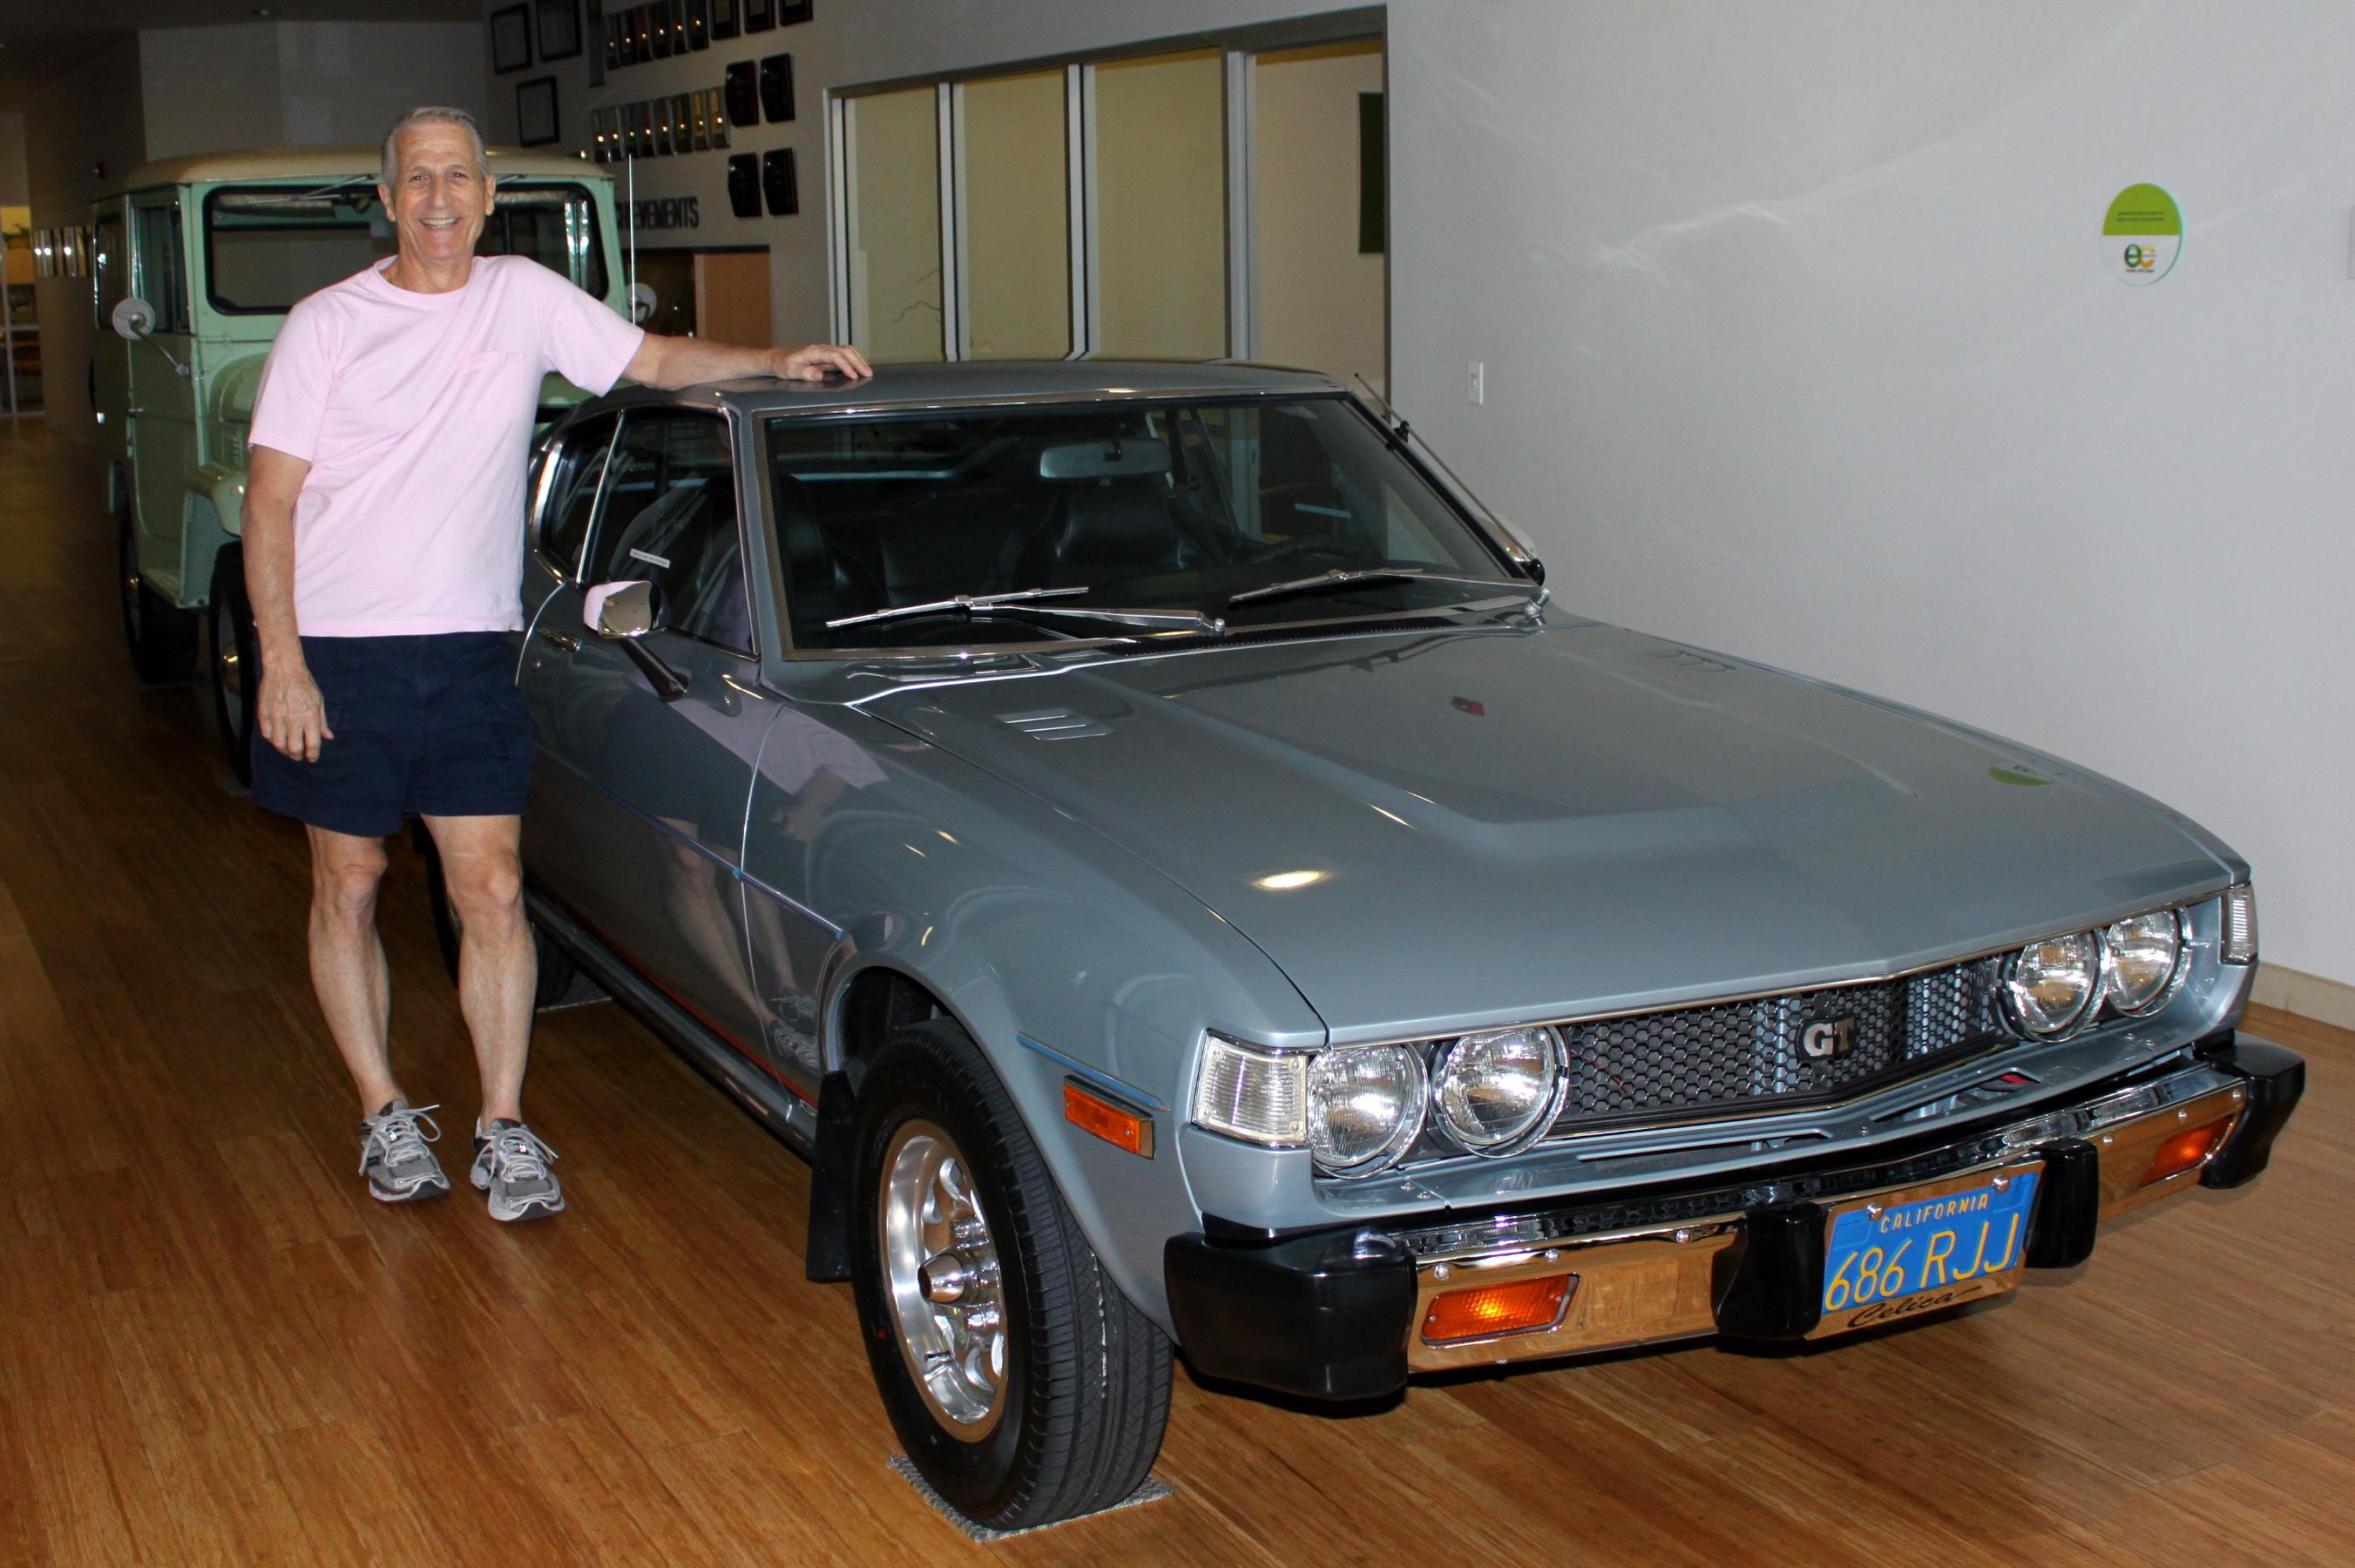 Toyota Dealership San Diego >> cars | Toyota of El Cajon